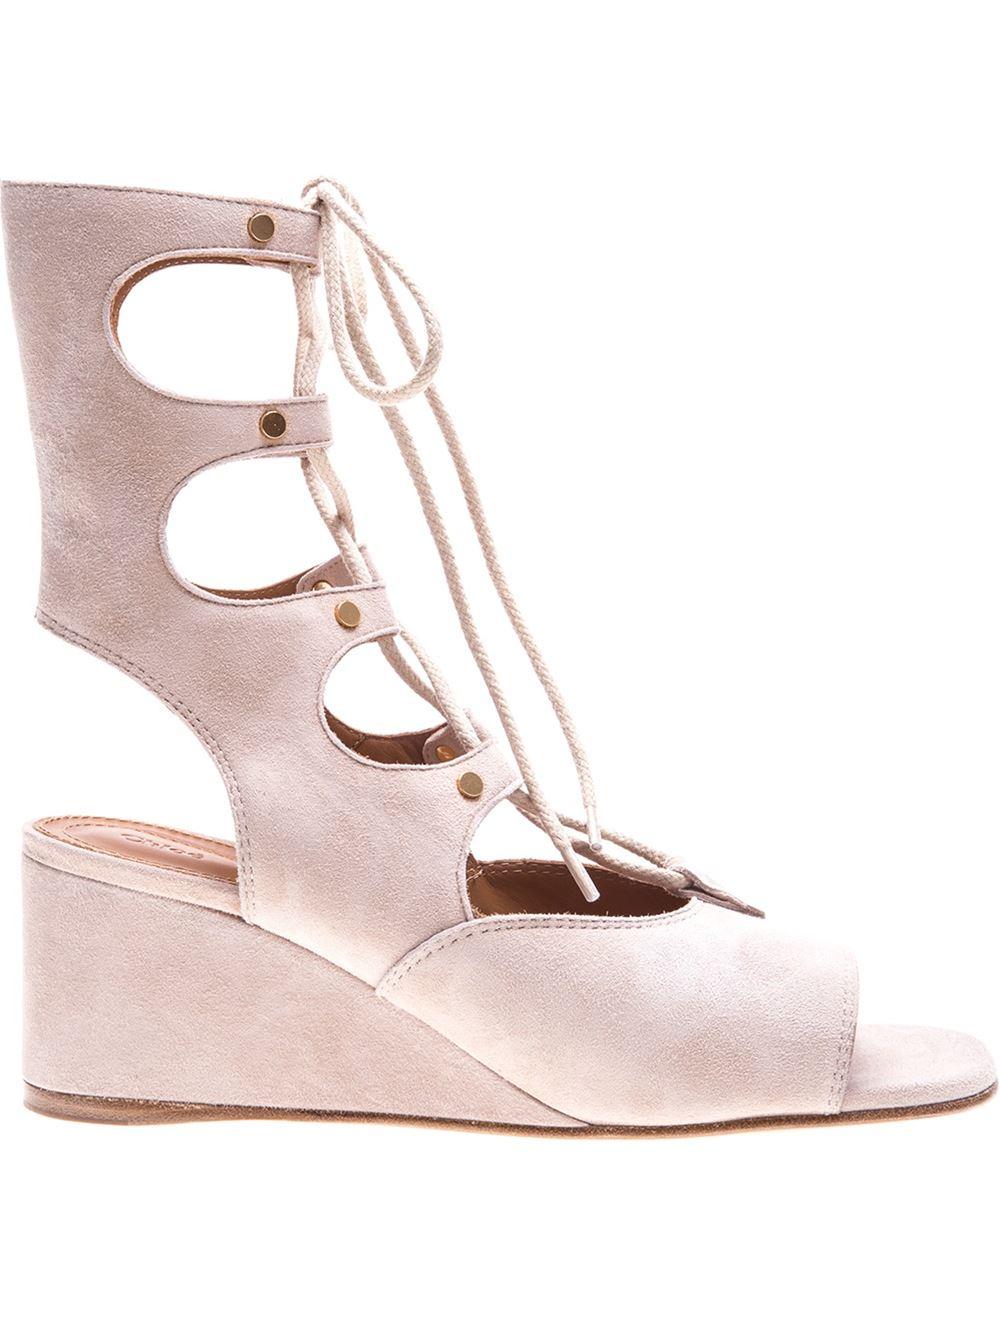 36497e2e8a9b Chloe Beige Sandals